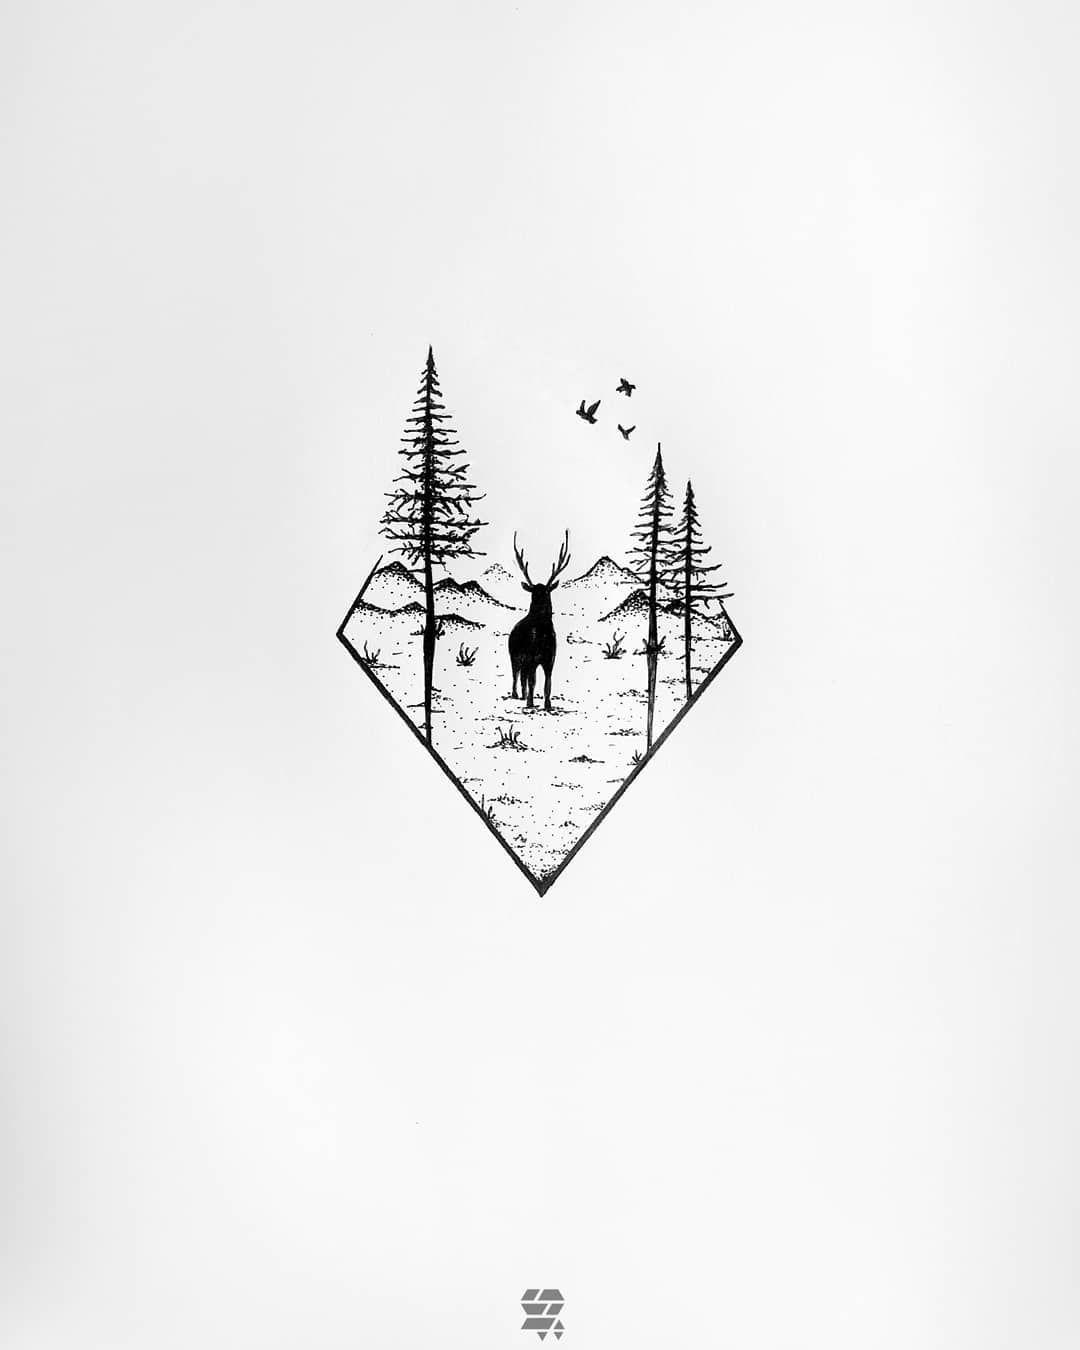 "S O U F I Δ N E     سفُيآن 〣 on Instagram ""WILD X FREE                   drawingtattoo tattoo artwork forestry inkd inkdrawing whiteonwhite worbla blackand blackpen…"" is part of Deer tattoo designs - 1,201 Likes, 27 Comments  〣 S O U F I Δ N E     سفُيآن 〣 (@soufiane el fanany) on Instagram ""WILD X FREE                   drawingtattoo tattoo artwork forestry inkd inkdrawing…"""